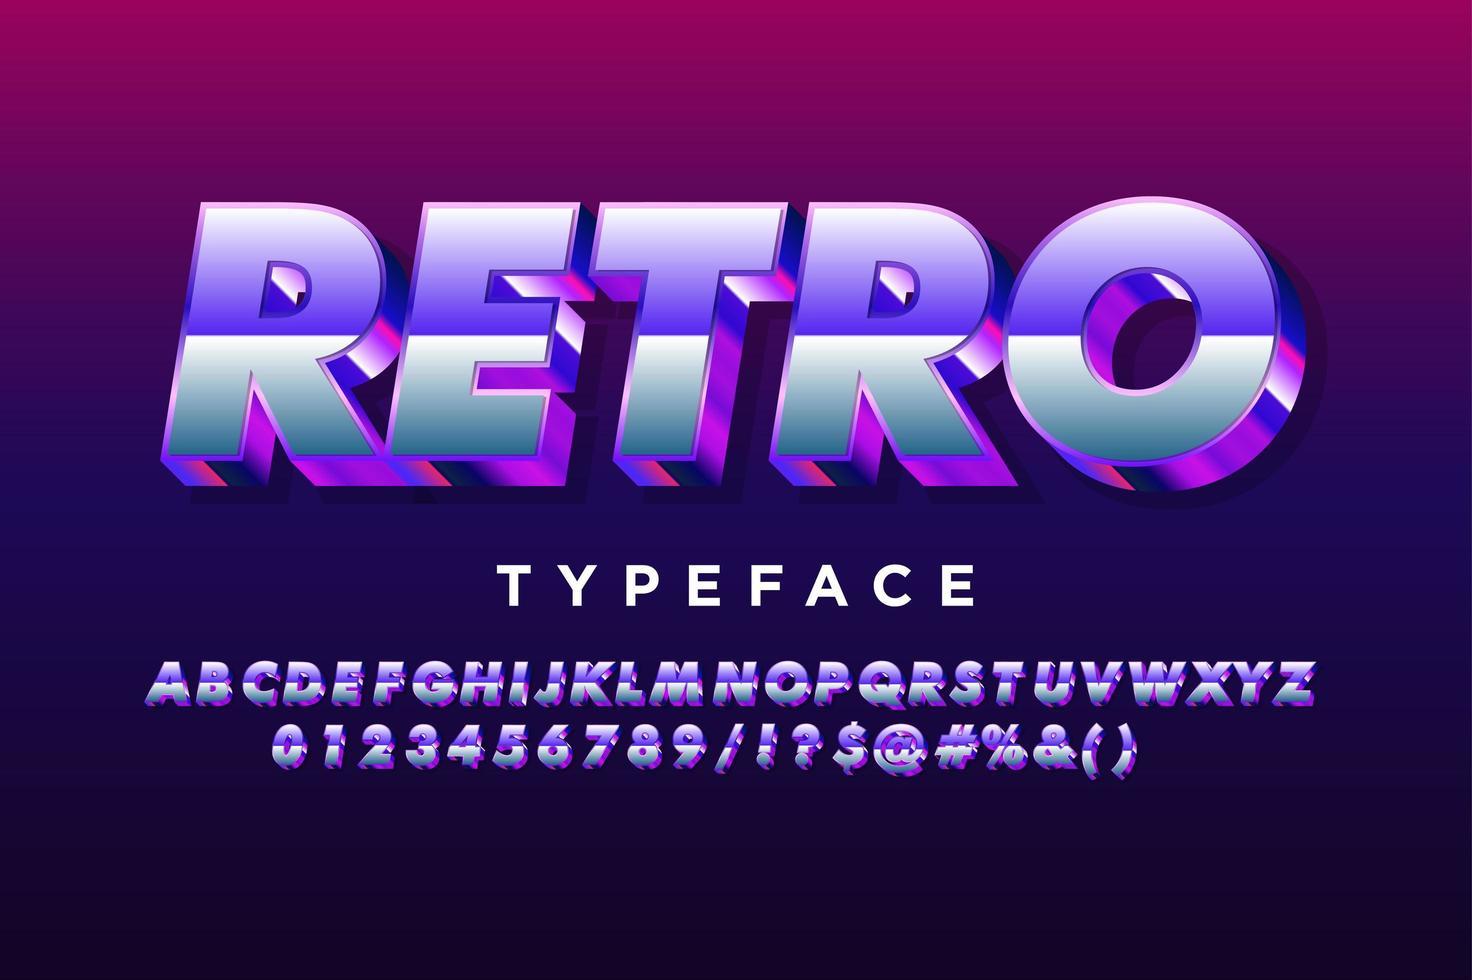 alfabeto retro metálico púrpura vector